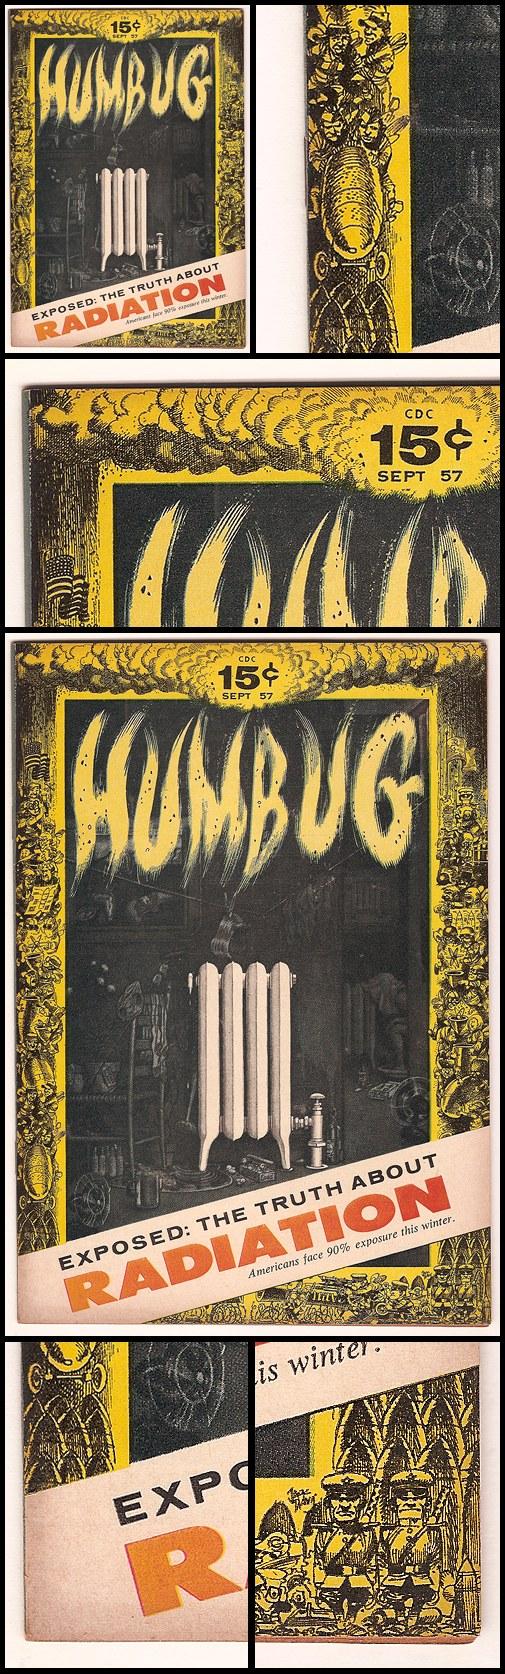 21. Humbug #2: File Copy (Sep 1957)